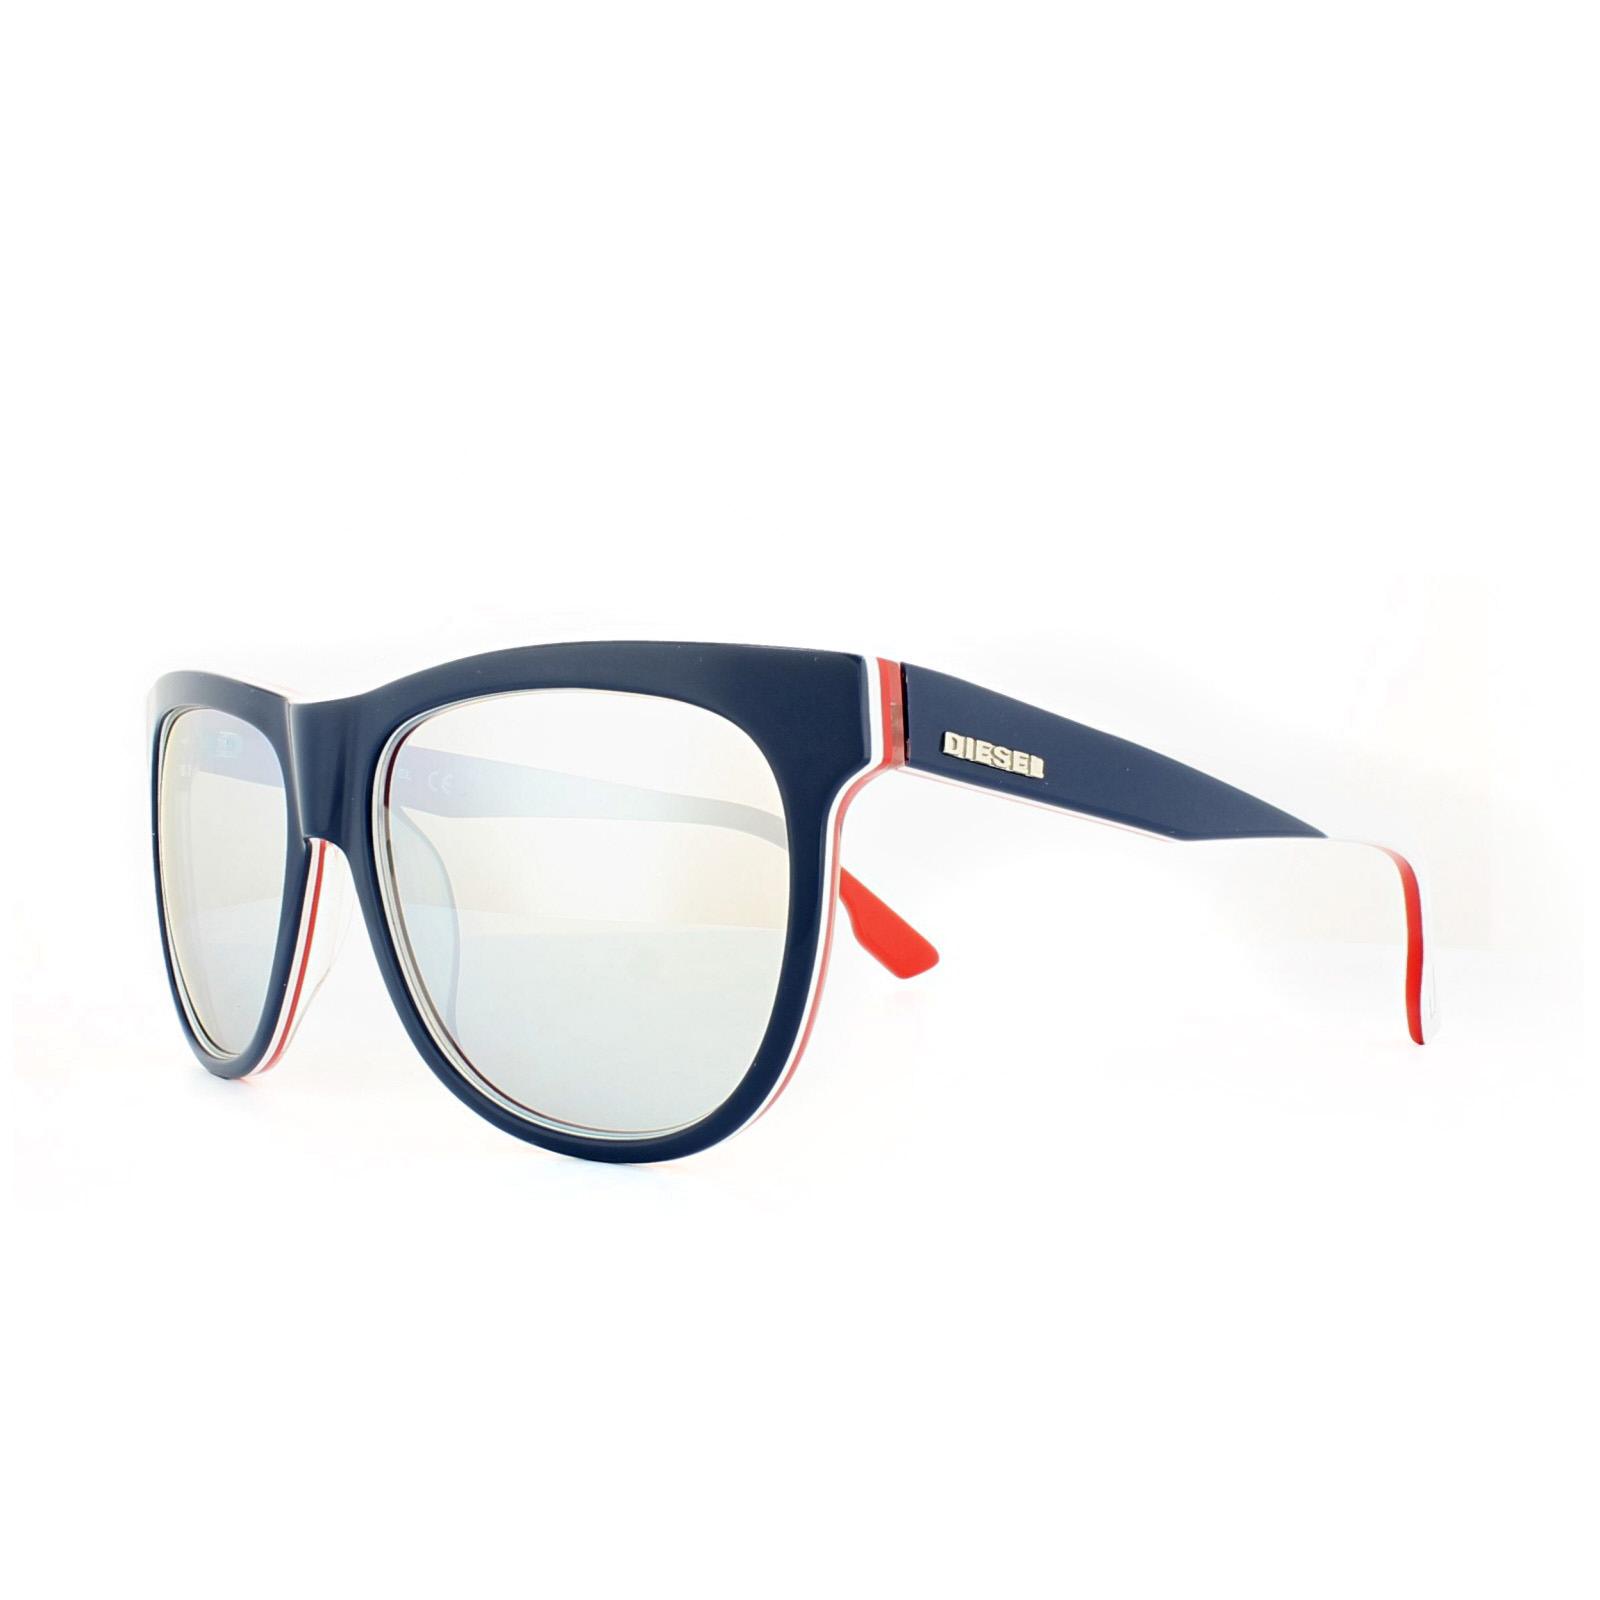 e2c40d79ab Diesel Sunglasses DL0112 92C Blue Red White Blue Mirror 664689647163 ...